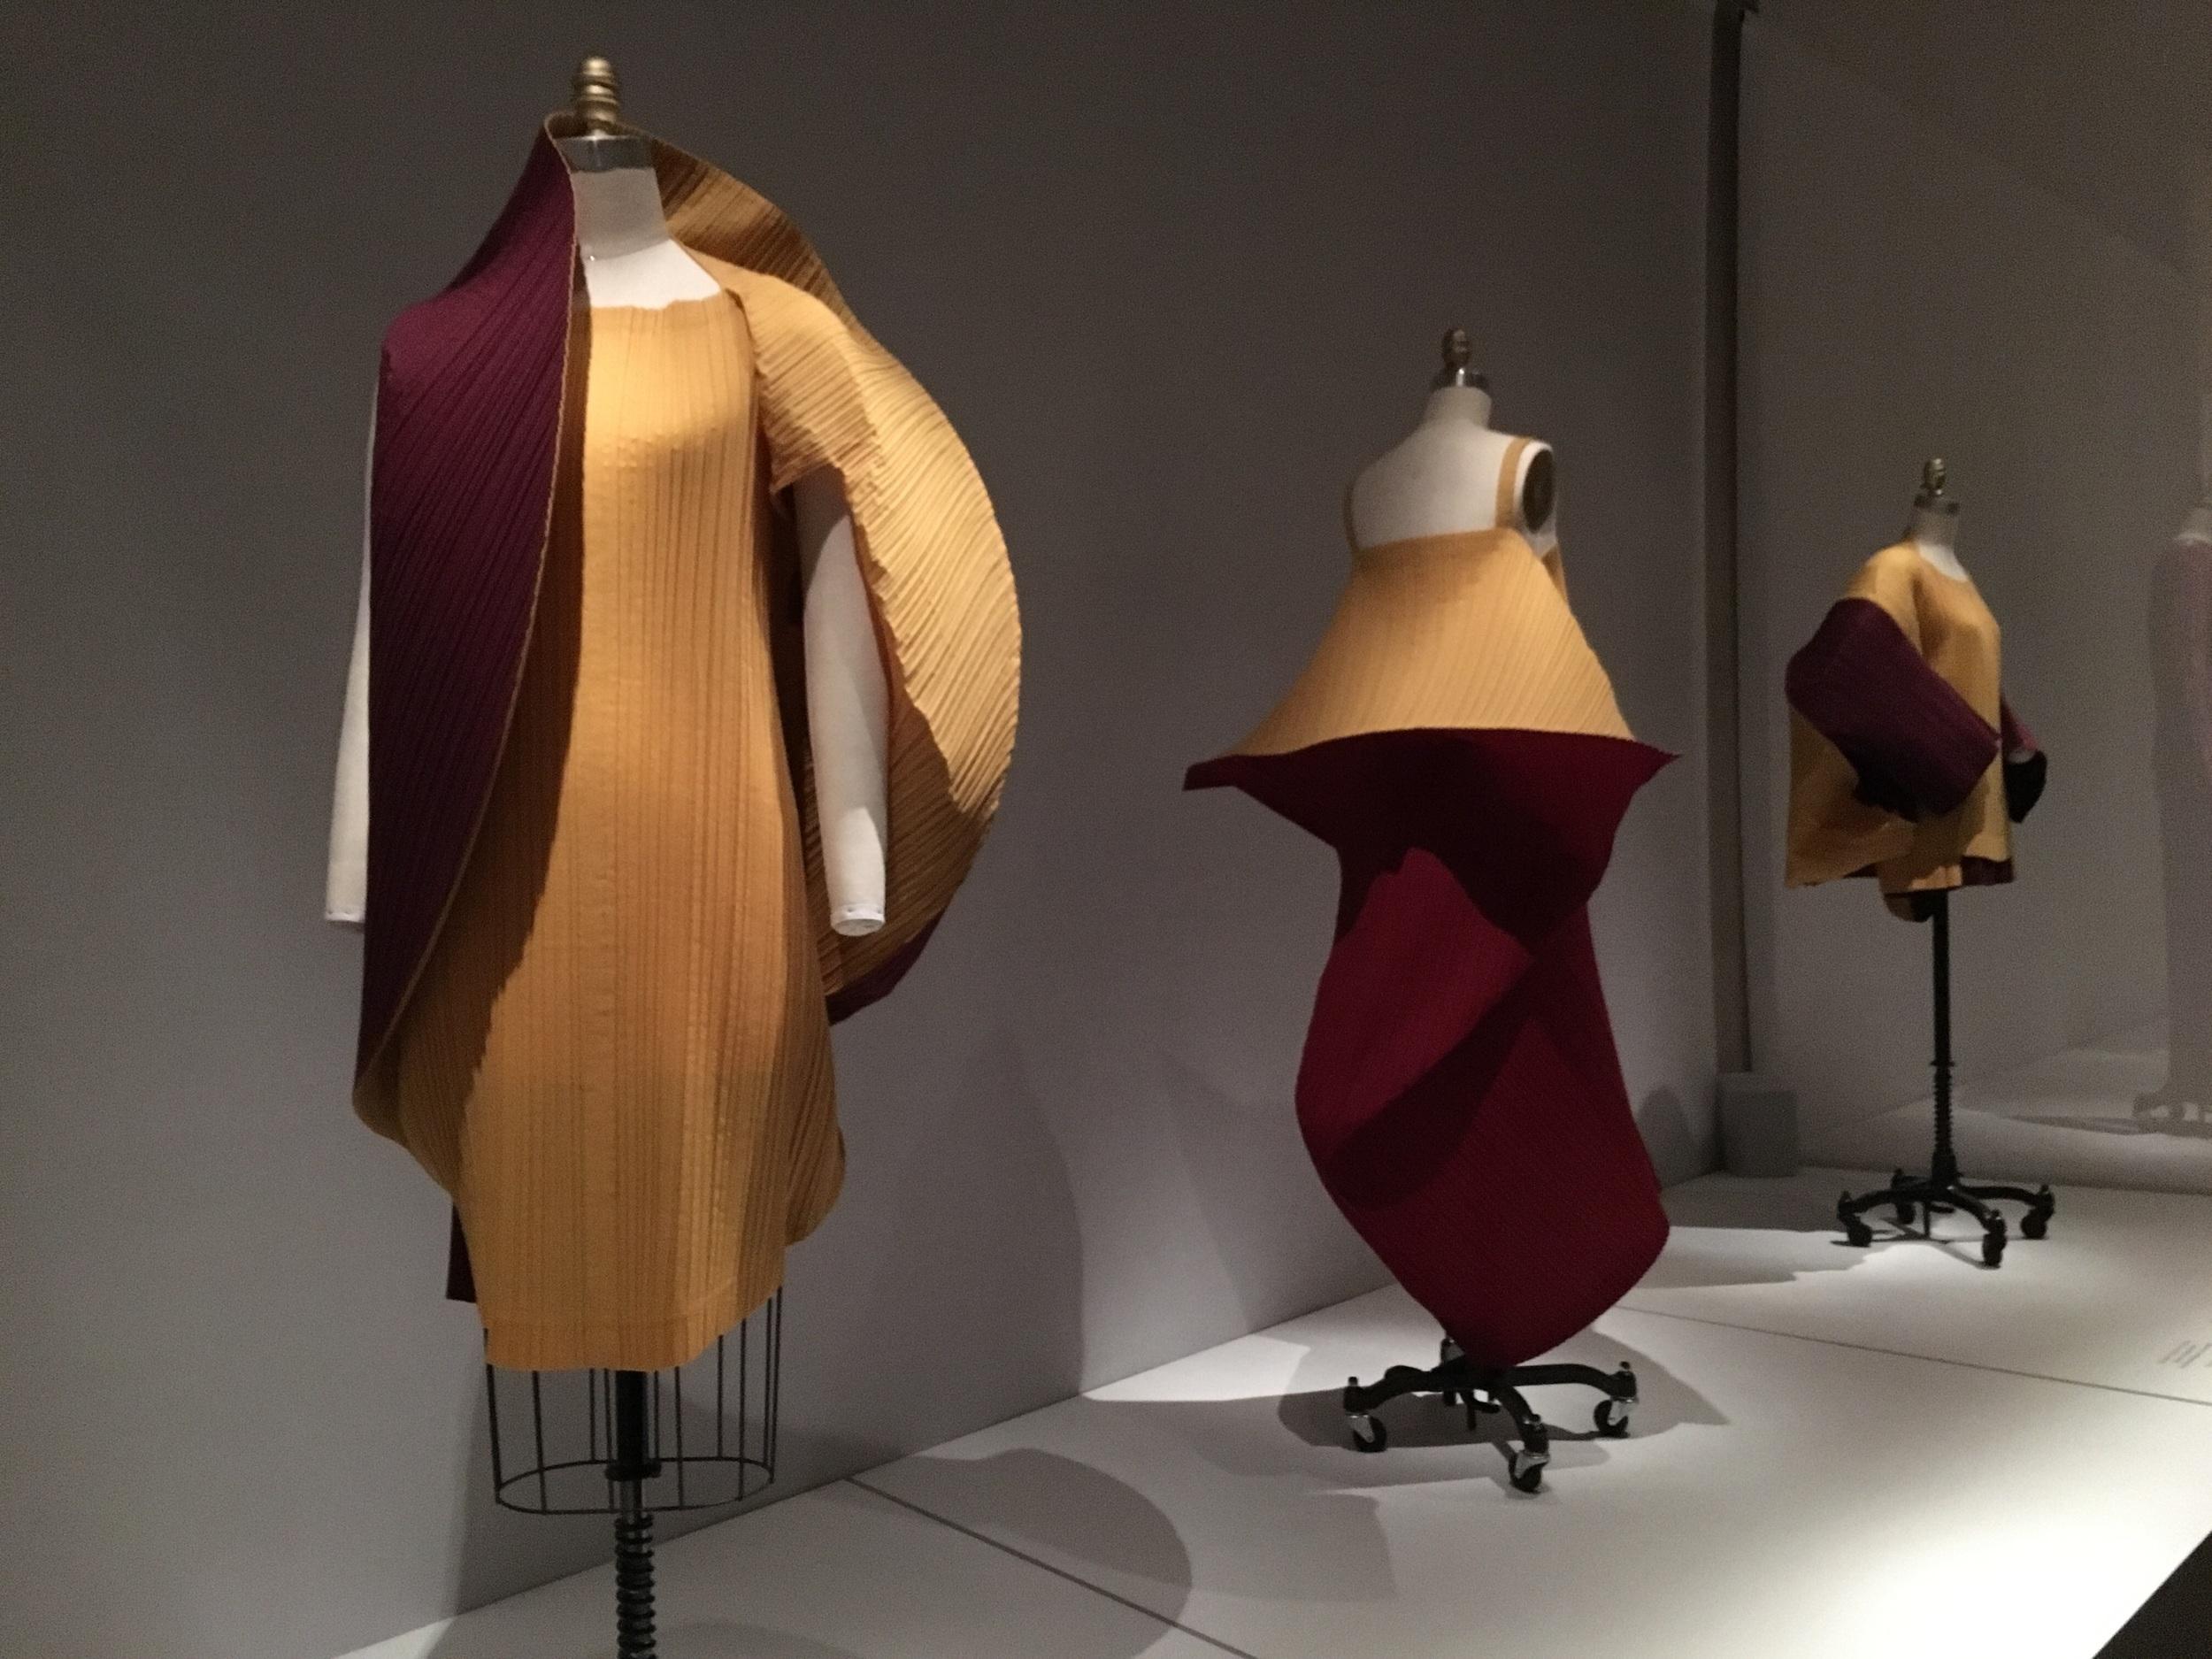 Miyake Design Studio  Issey Miyake  SS 1990, prêt-à-porter  Machine-garment-pleated, machine-sewn yellow and red-purple polyester-linen plain weave